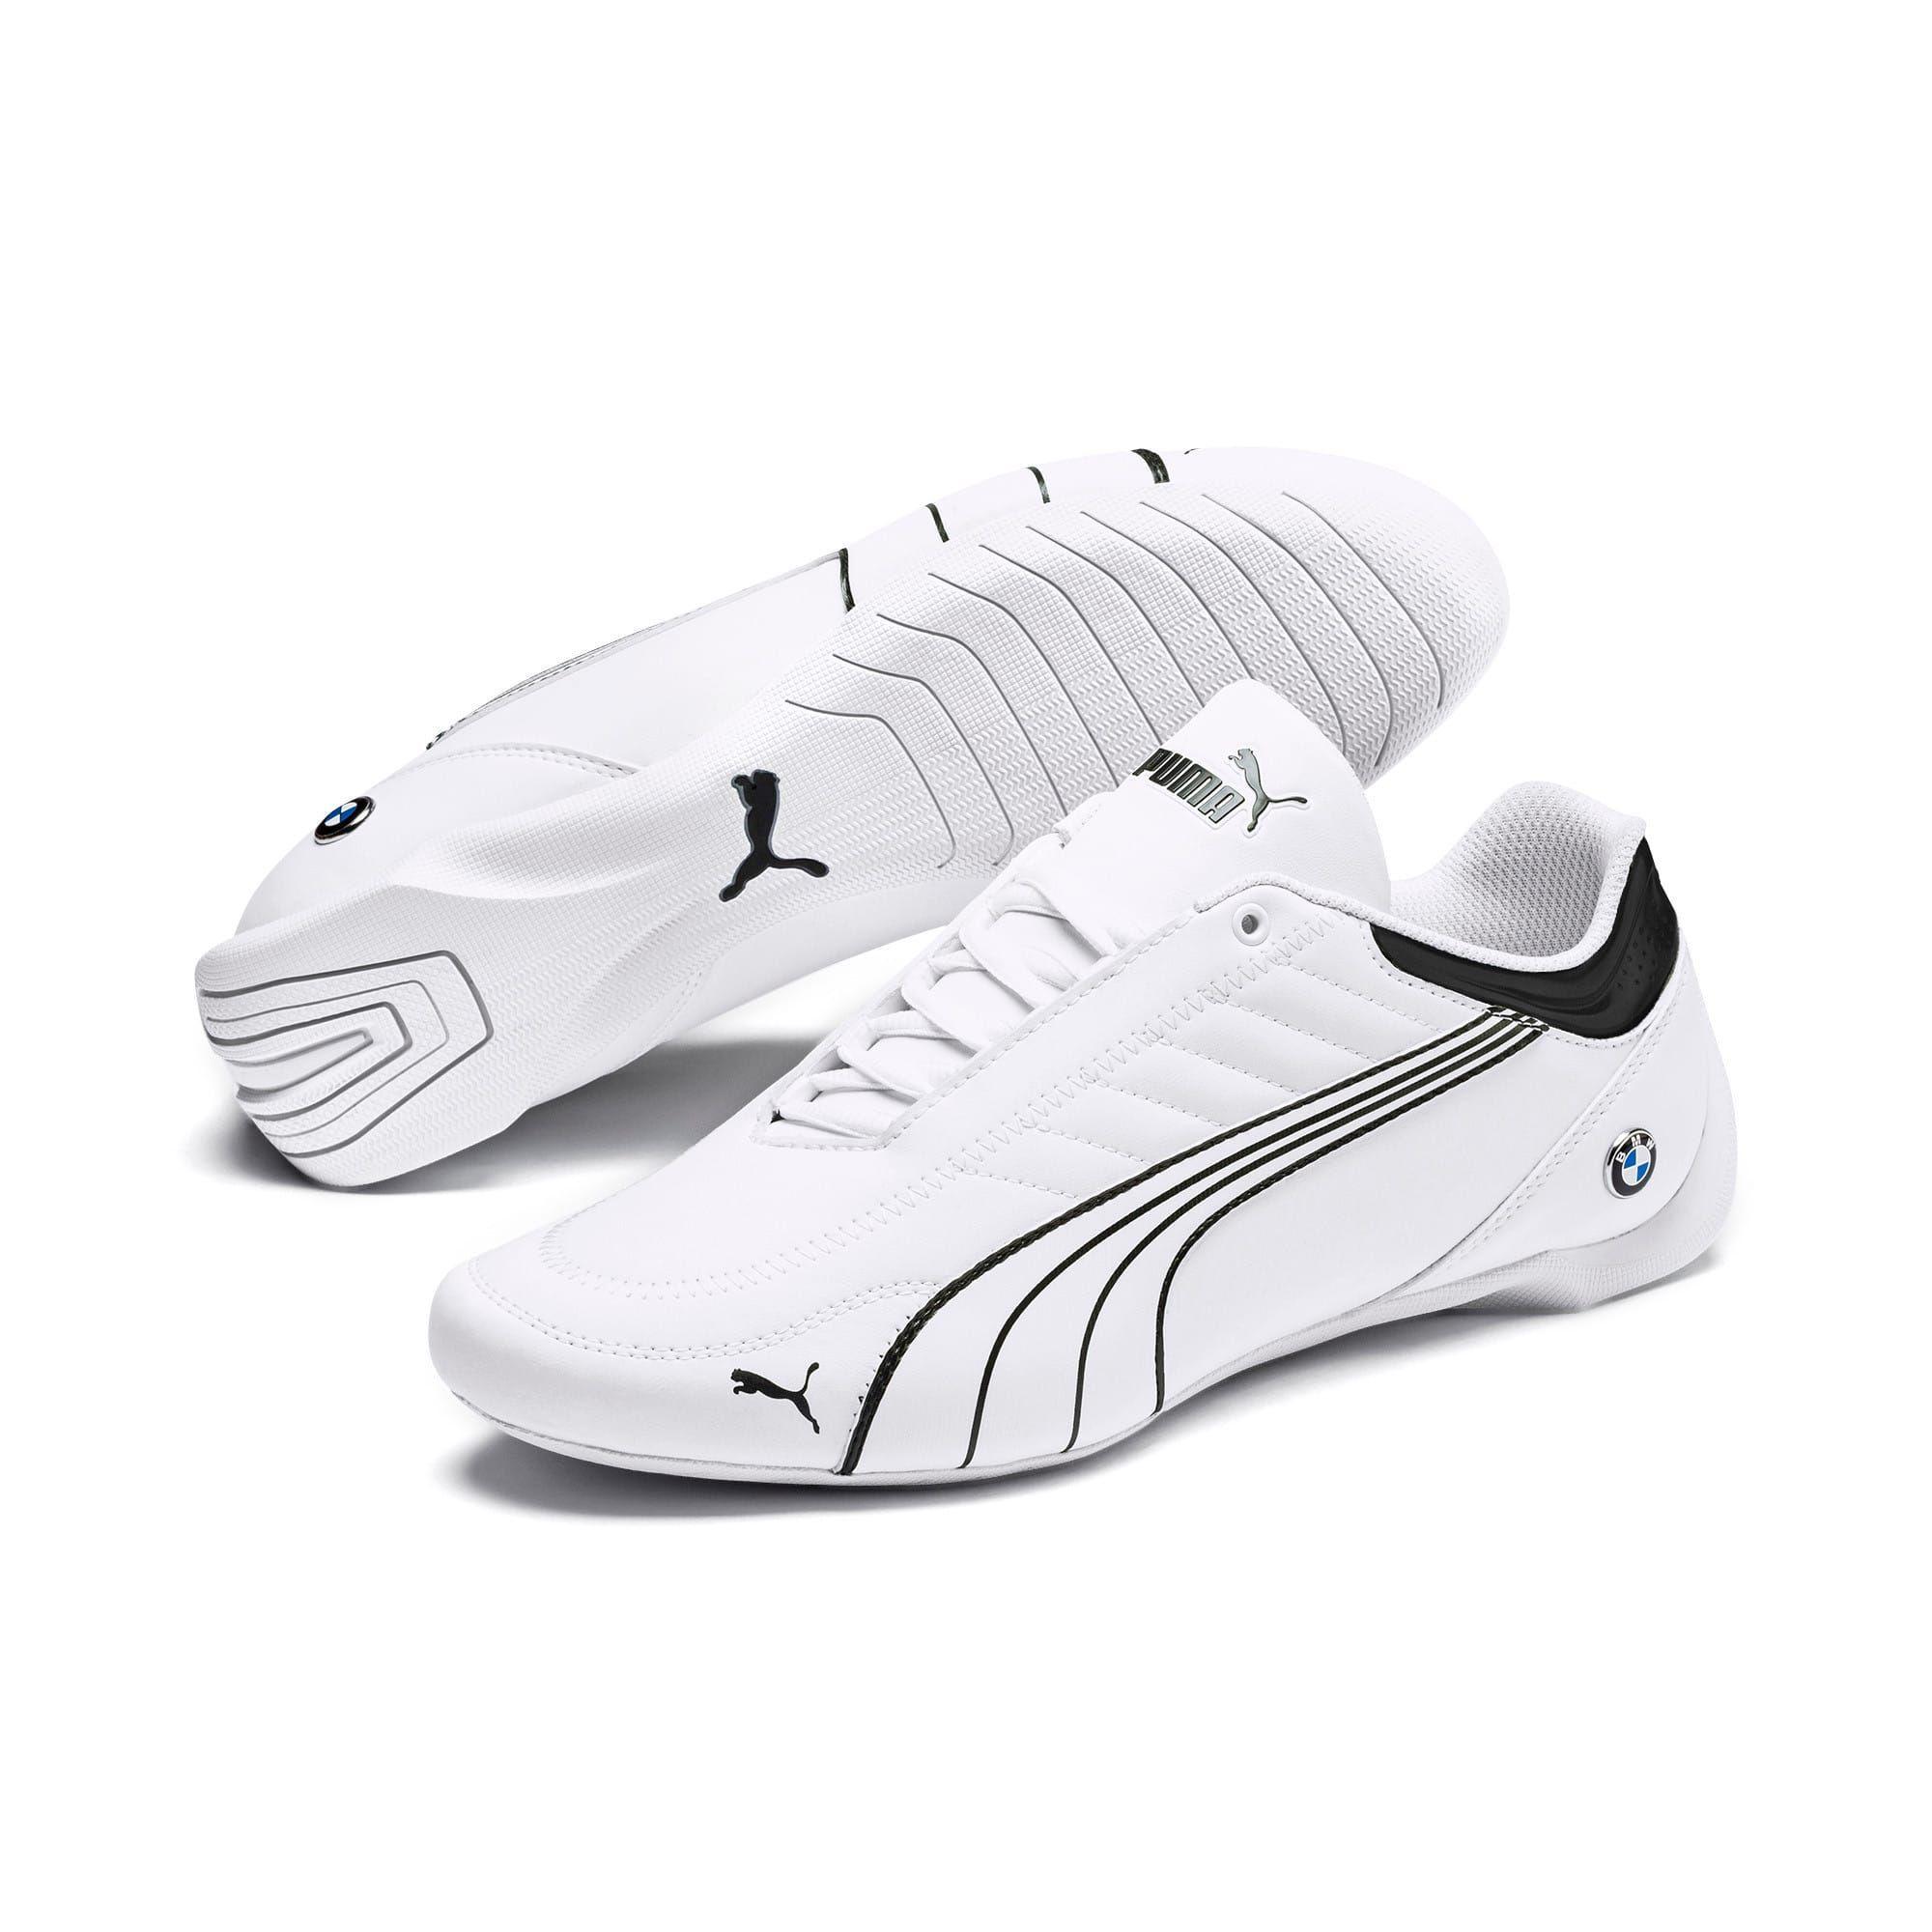 Motorsport shoes, Mens puma shoes, Cat